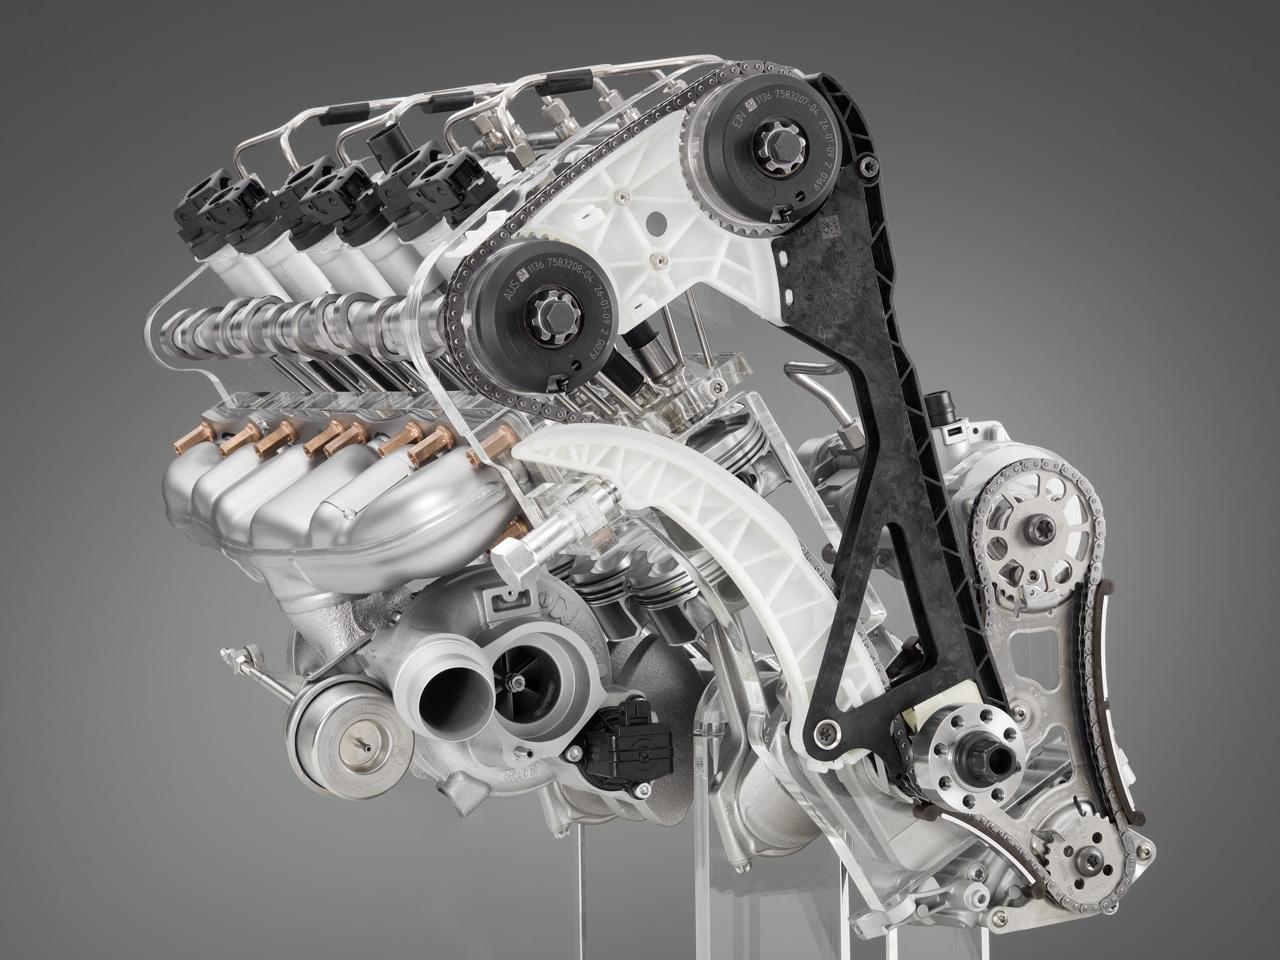 analysis the n55b30 engine